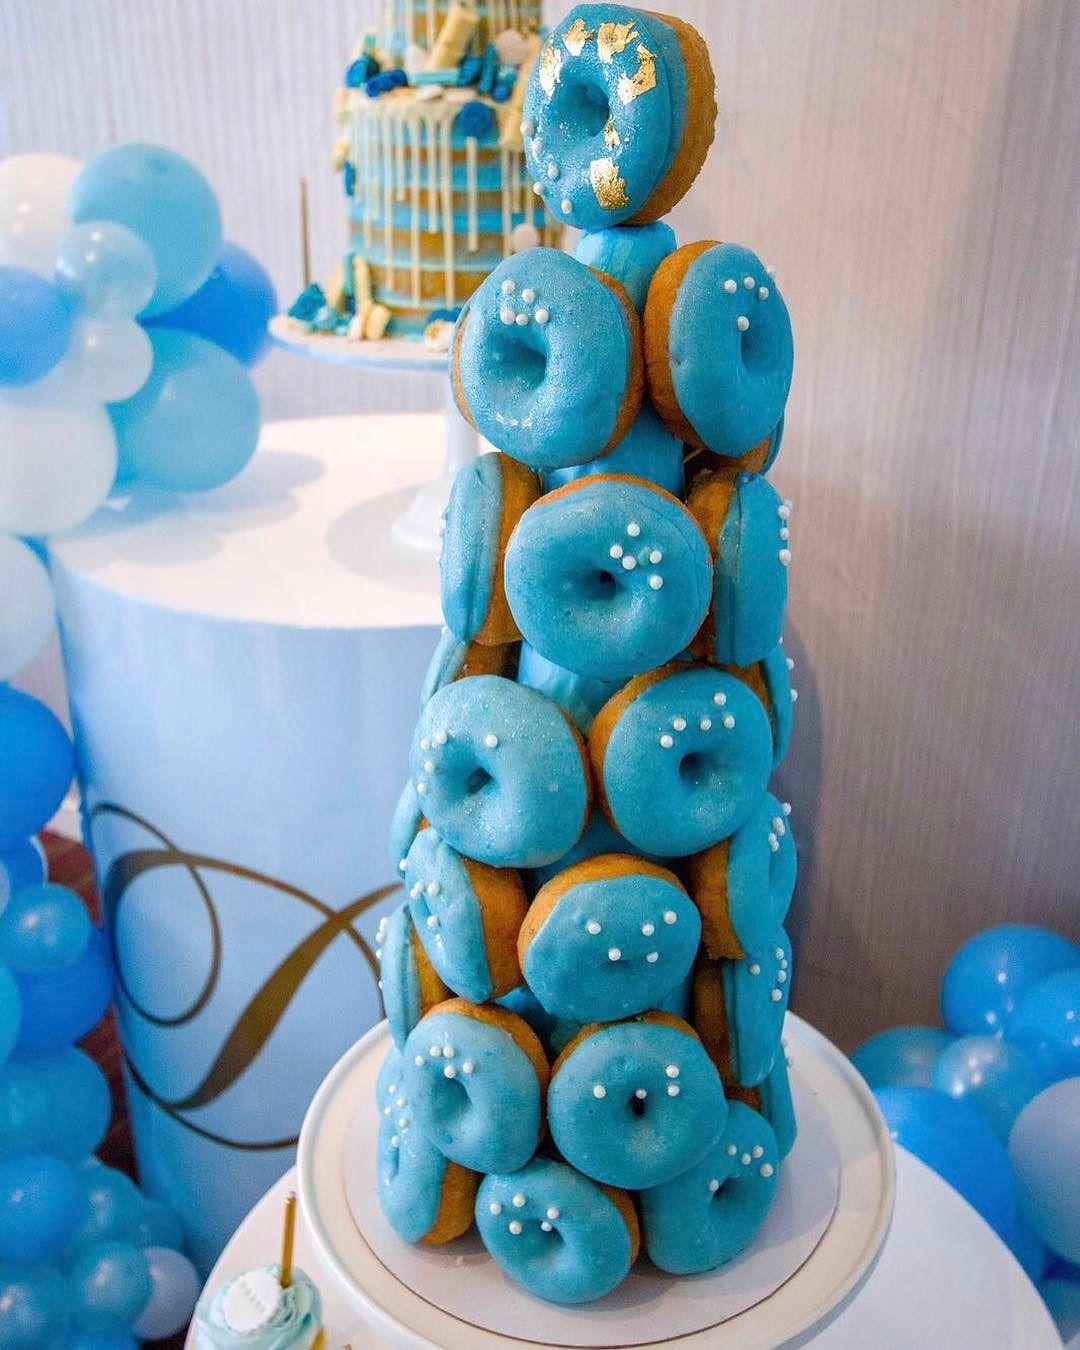 decoracion de torre de donas para mesa de dulces (1)